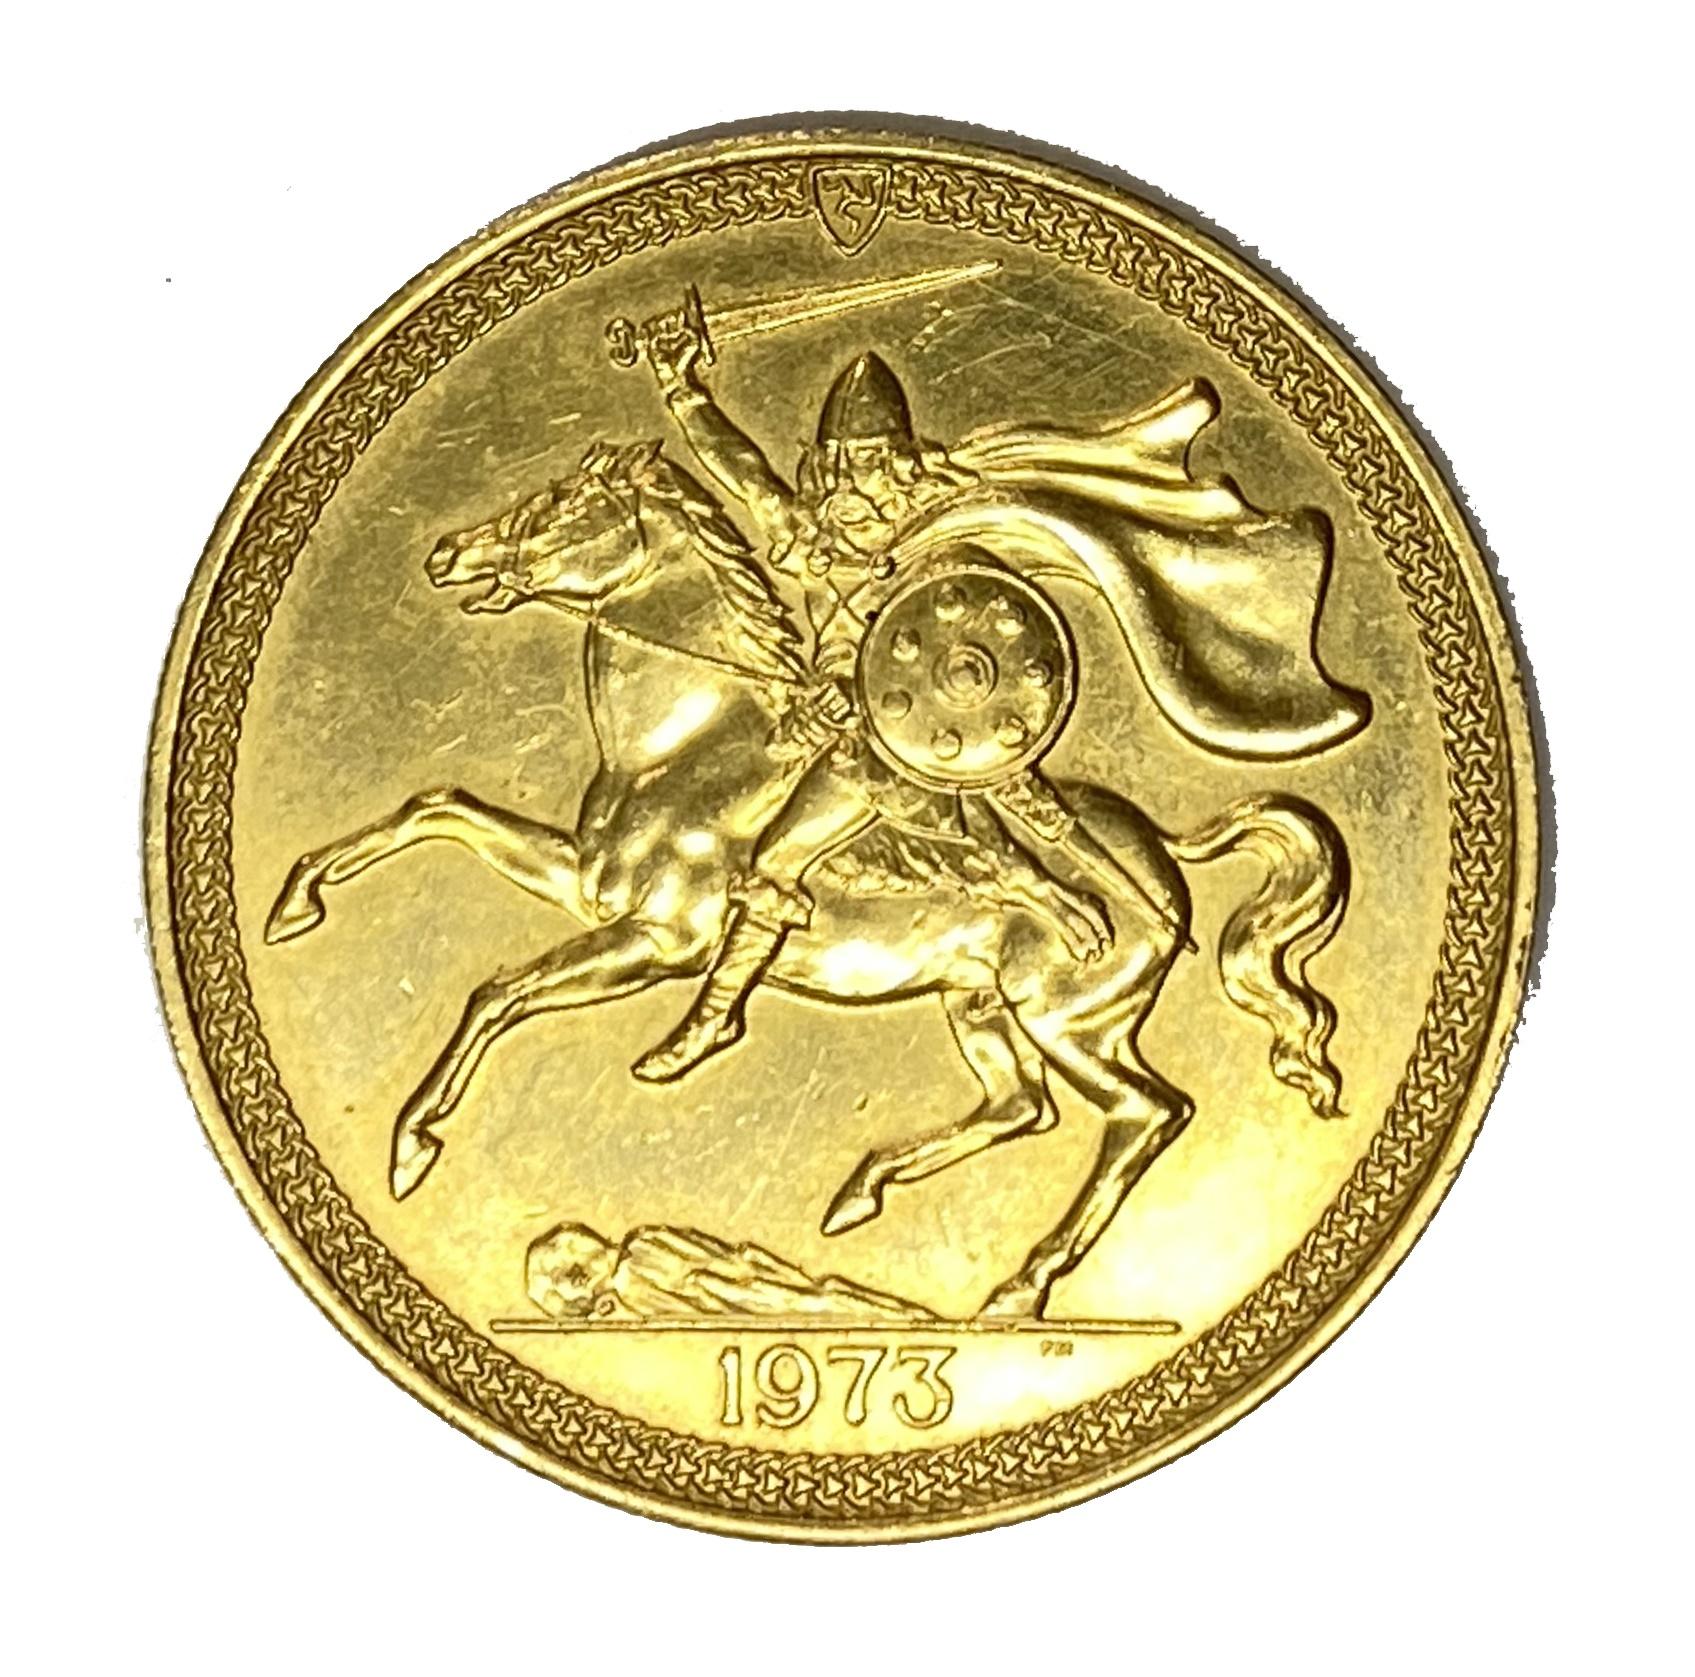 Elizabeth II Isle of Man £5 gold coin, 1973 - Image 2 of 2